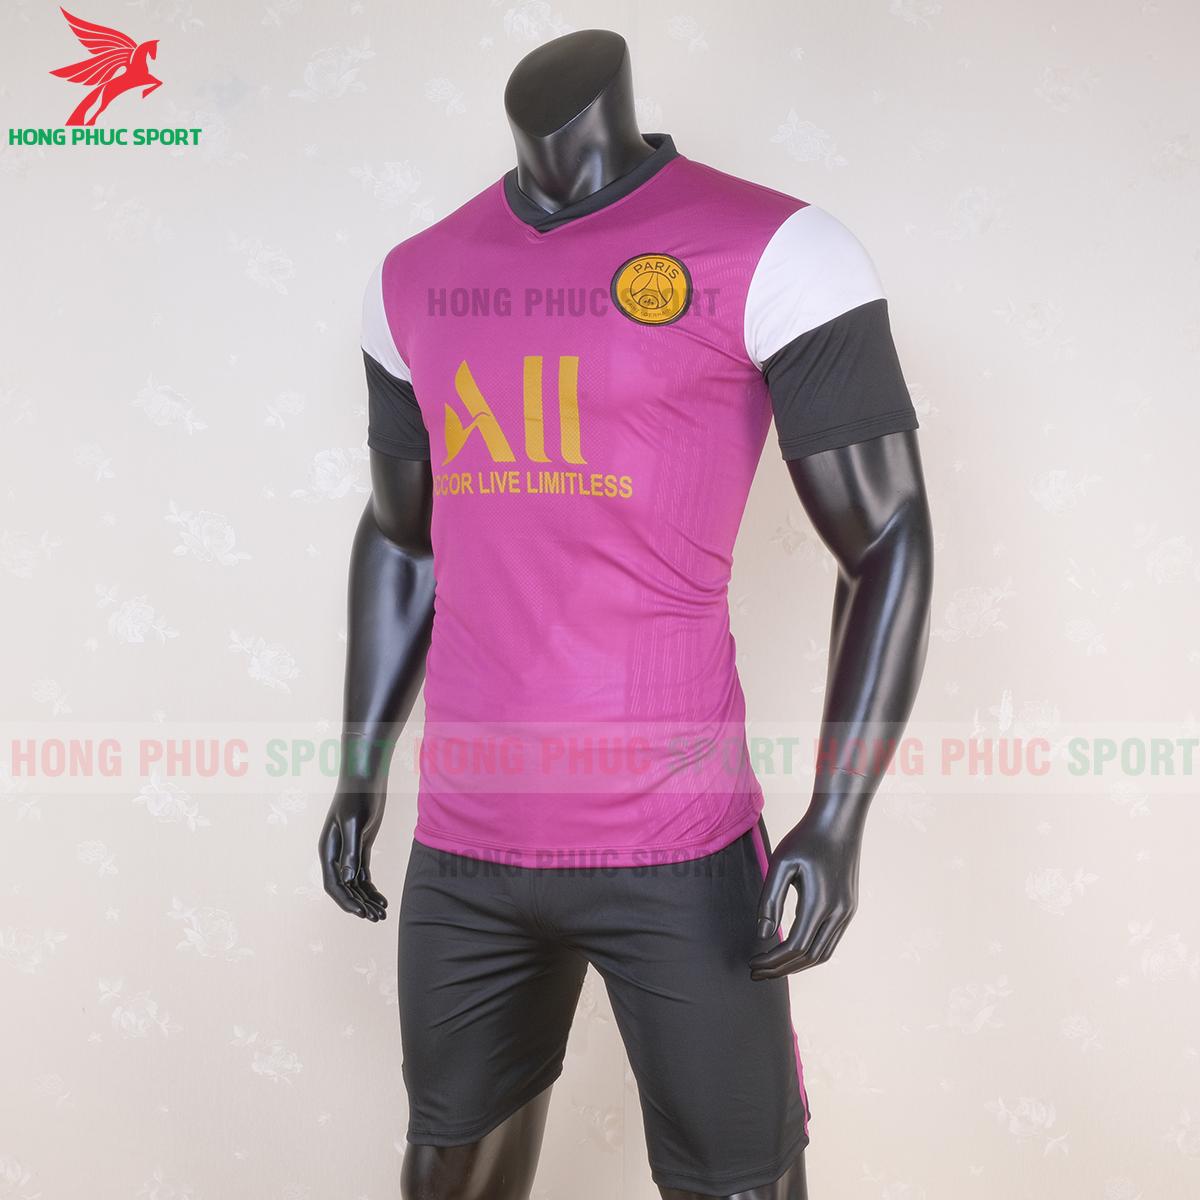 https://cdn.hongphucsport.com/unsafe/s4.shopbay.vn/files/285/ao-bong-da-psg-mau-thu-3-2020-2021-tim-2-5f6da0ad66867.png